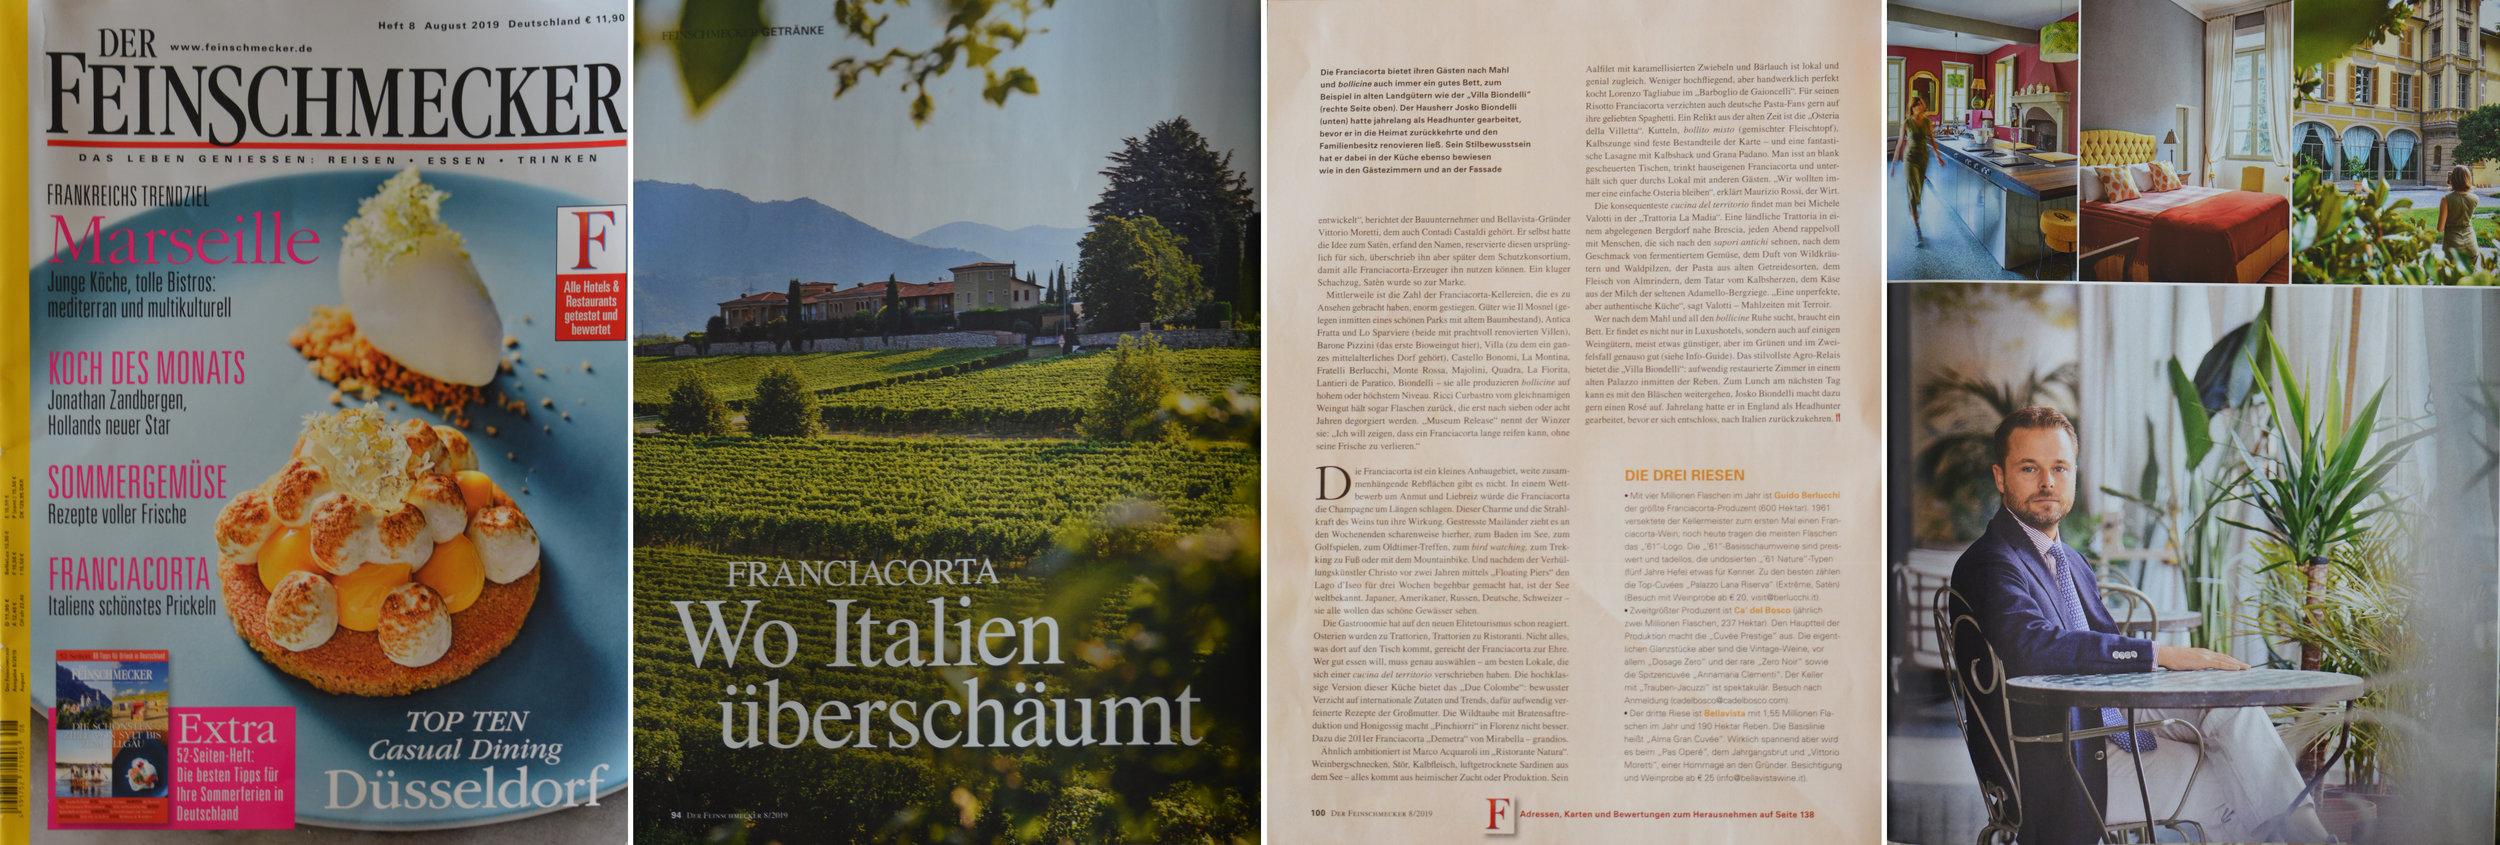 german-article-villa.jpg